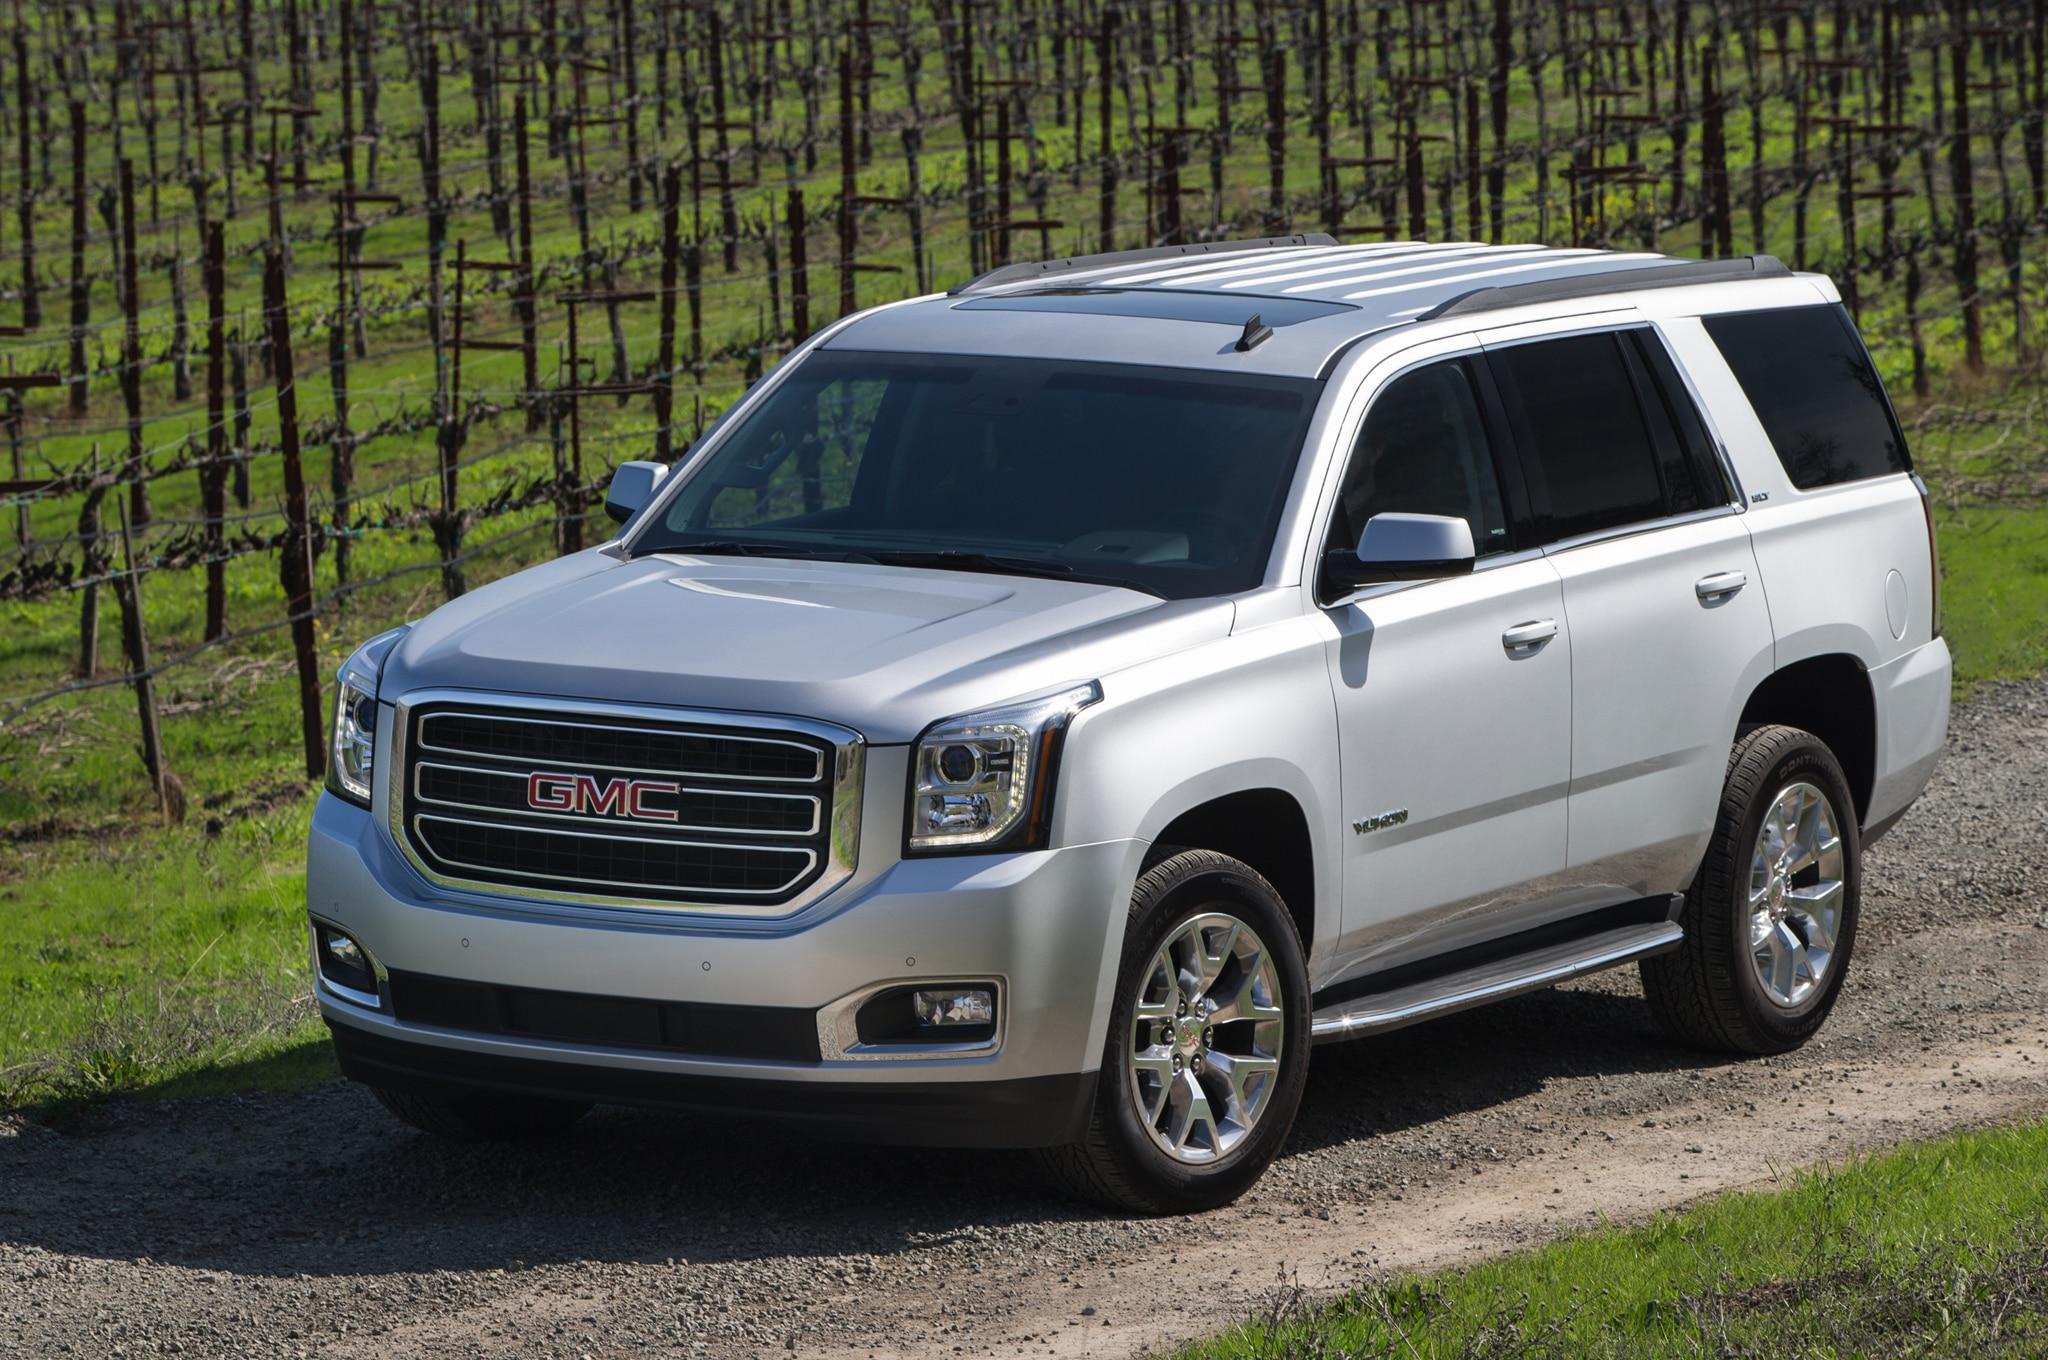 2015 GMC Yukon and Yukon XL Review - Automobile Magazine